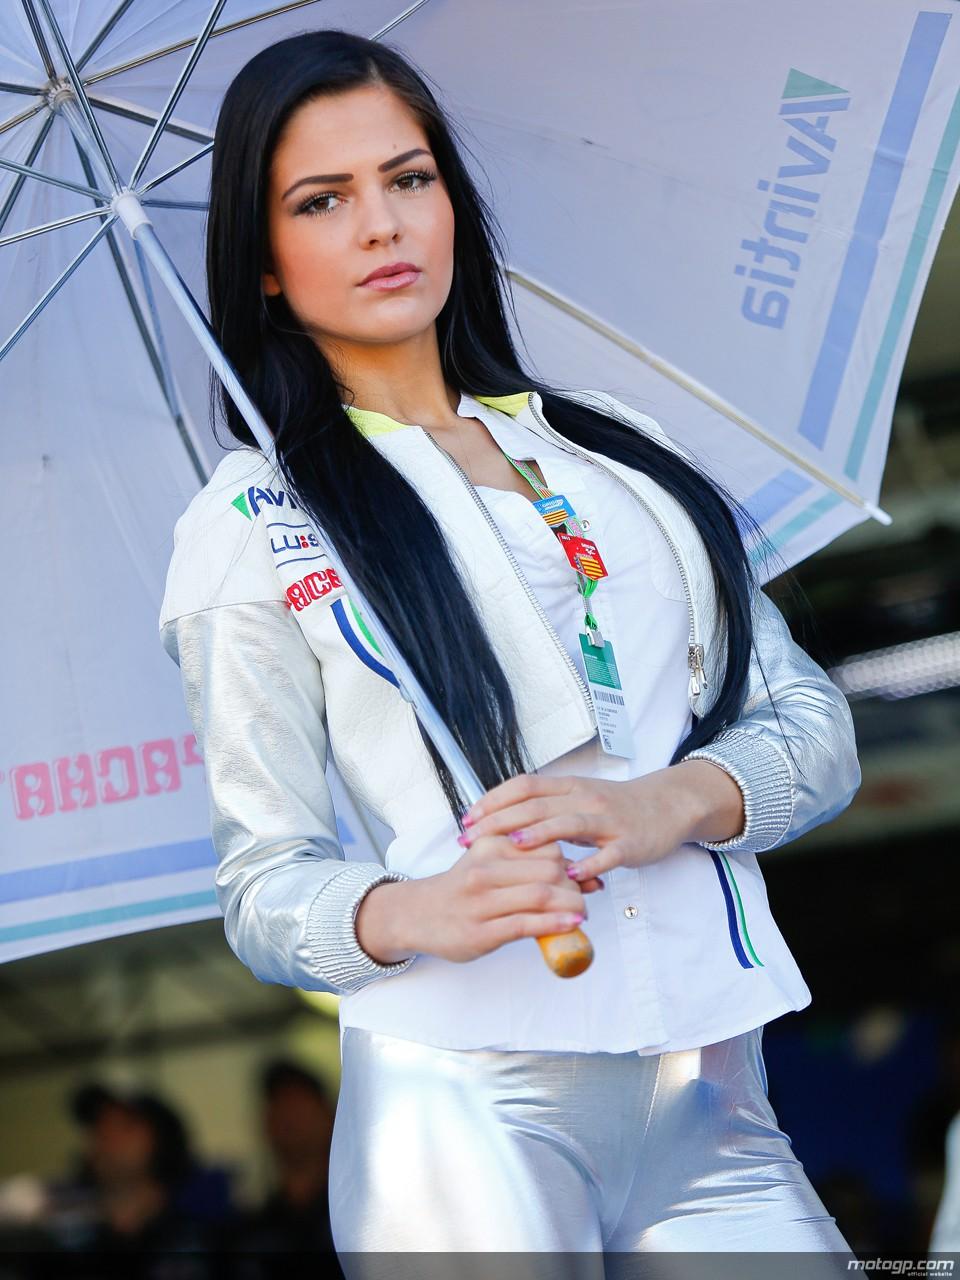 2013 MotoGP: the Beautiful Paddock Girls at Sachsenring